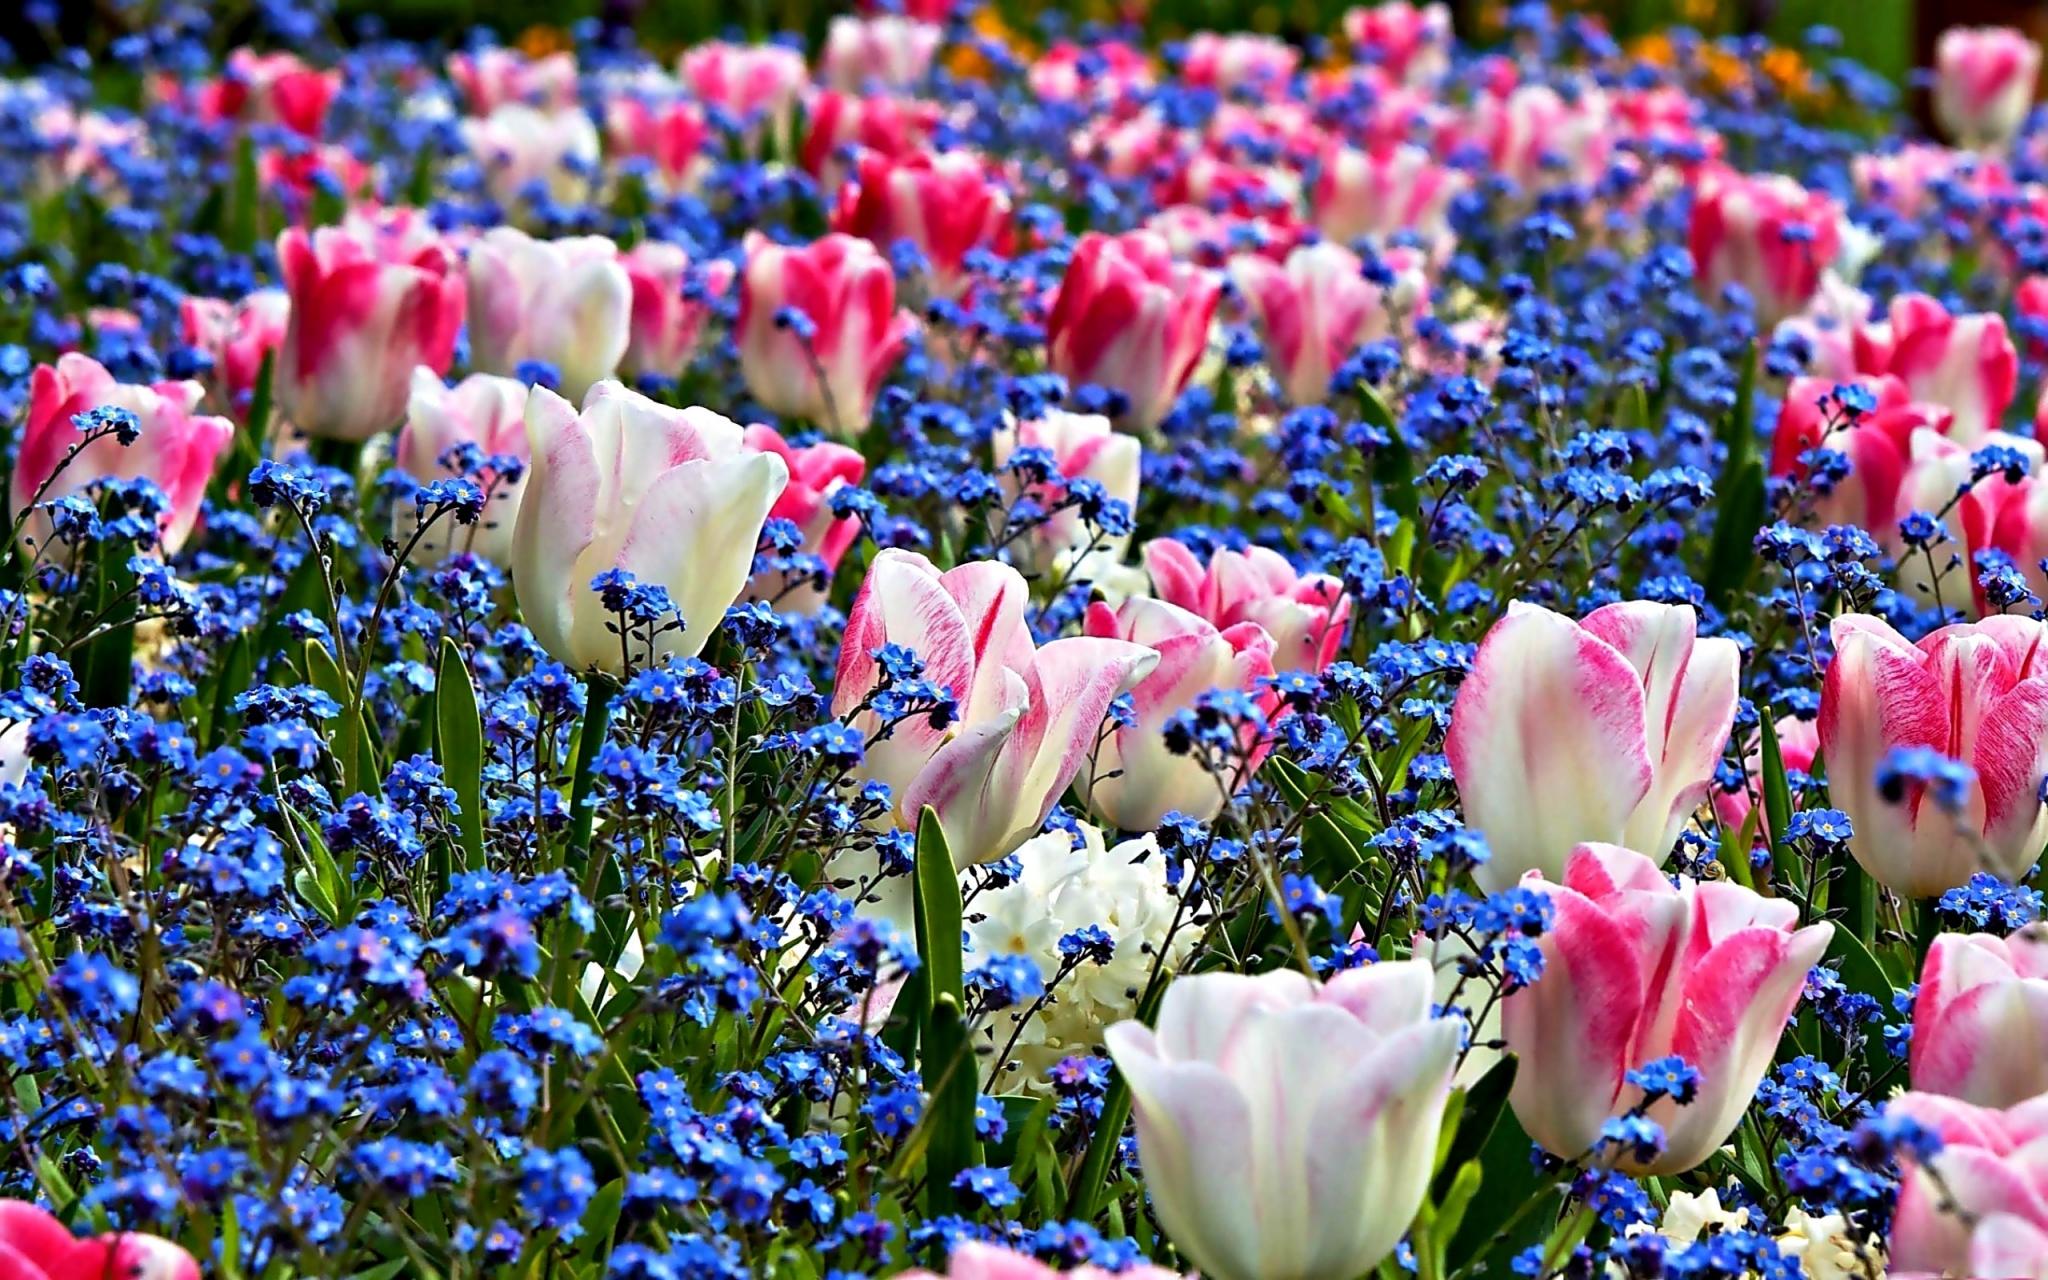 Spring Desktop Wallpaper 730x410 px 13117 Kb   Picseriocom 2048x1280